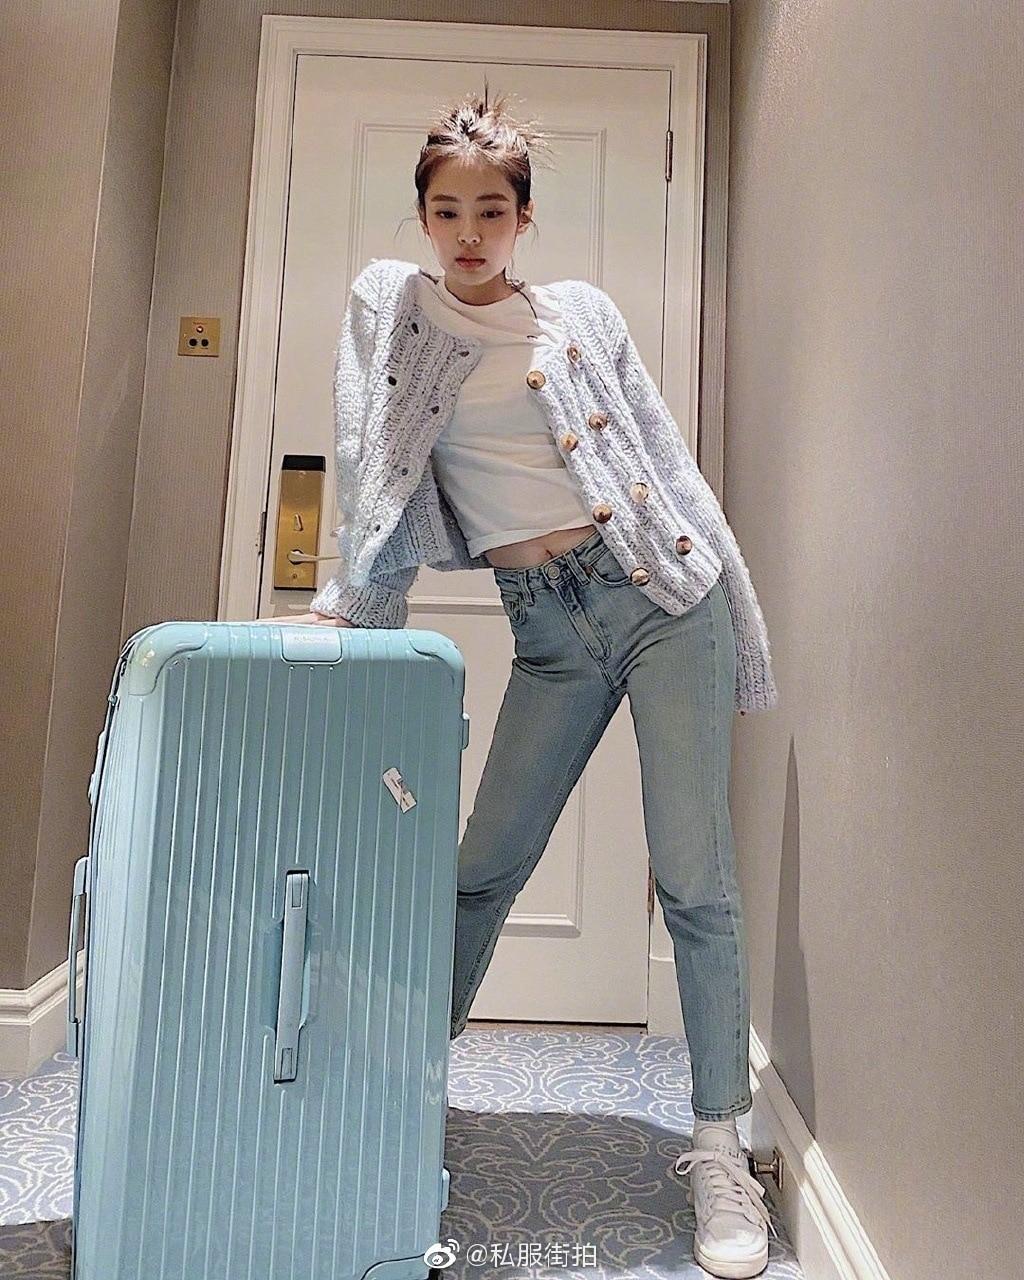 US $12.98 20% OFF|kpop Korean Celebrity Light blue long sleeved knitted cardigan sweater coat and white short t shirt tops+slim jeans women